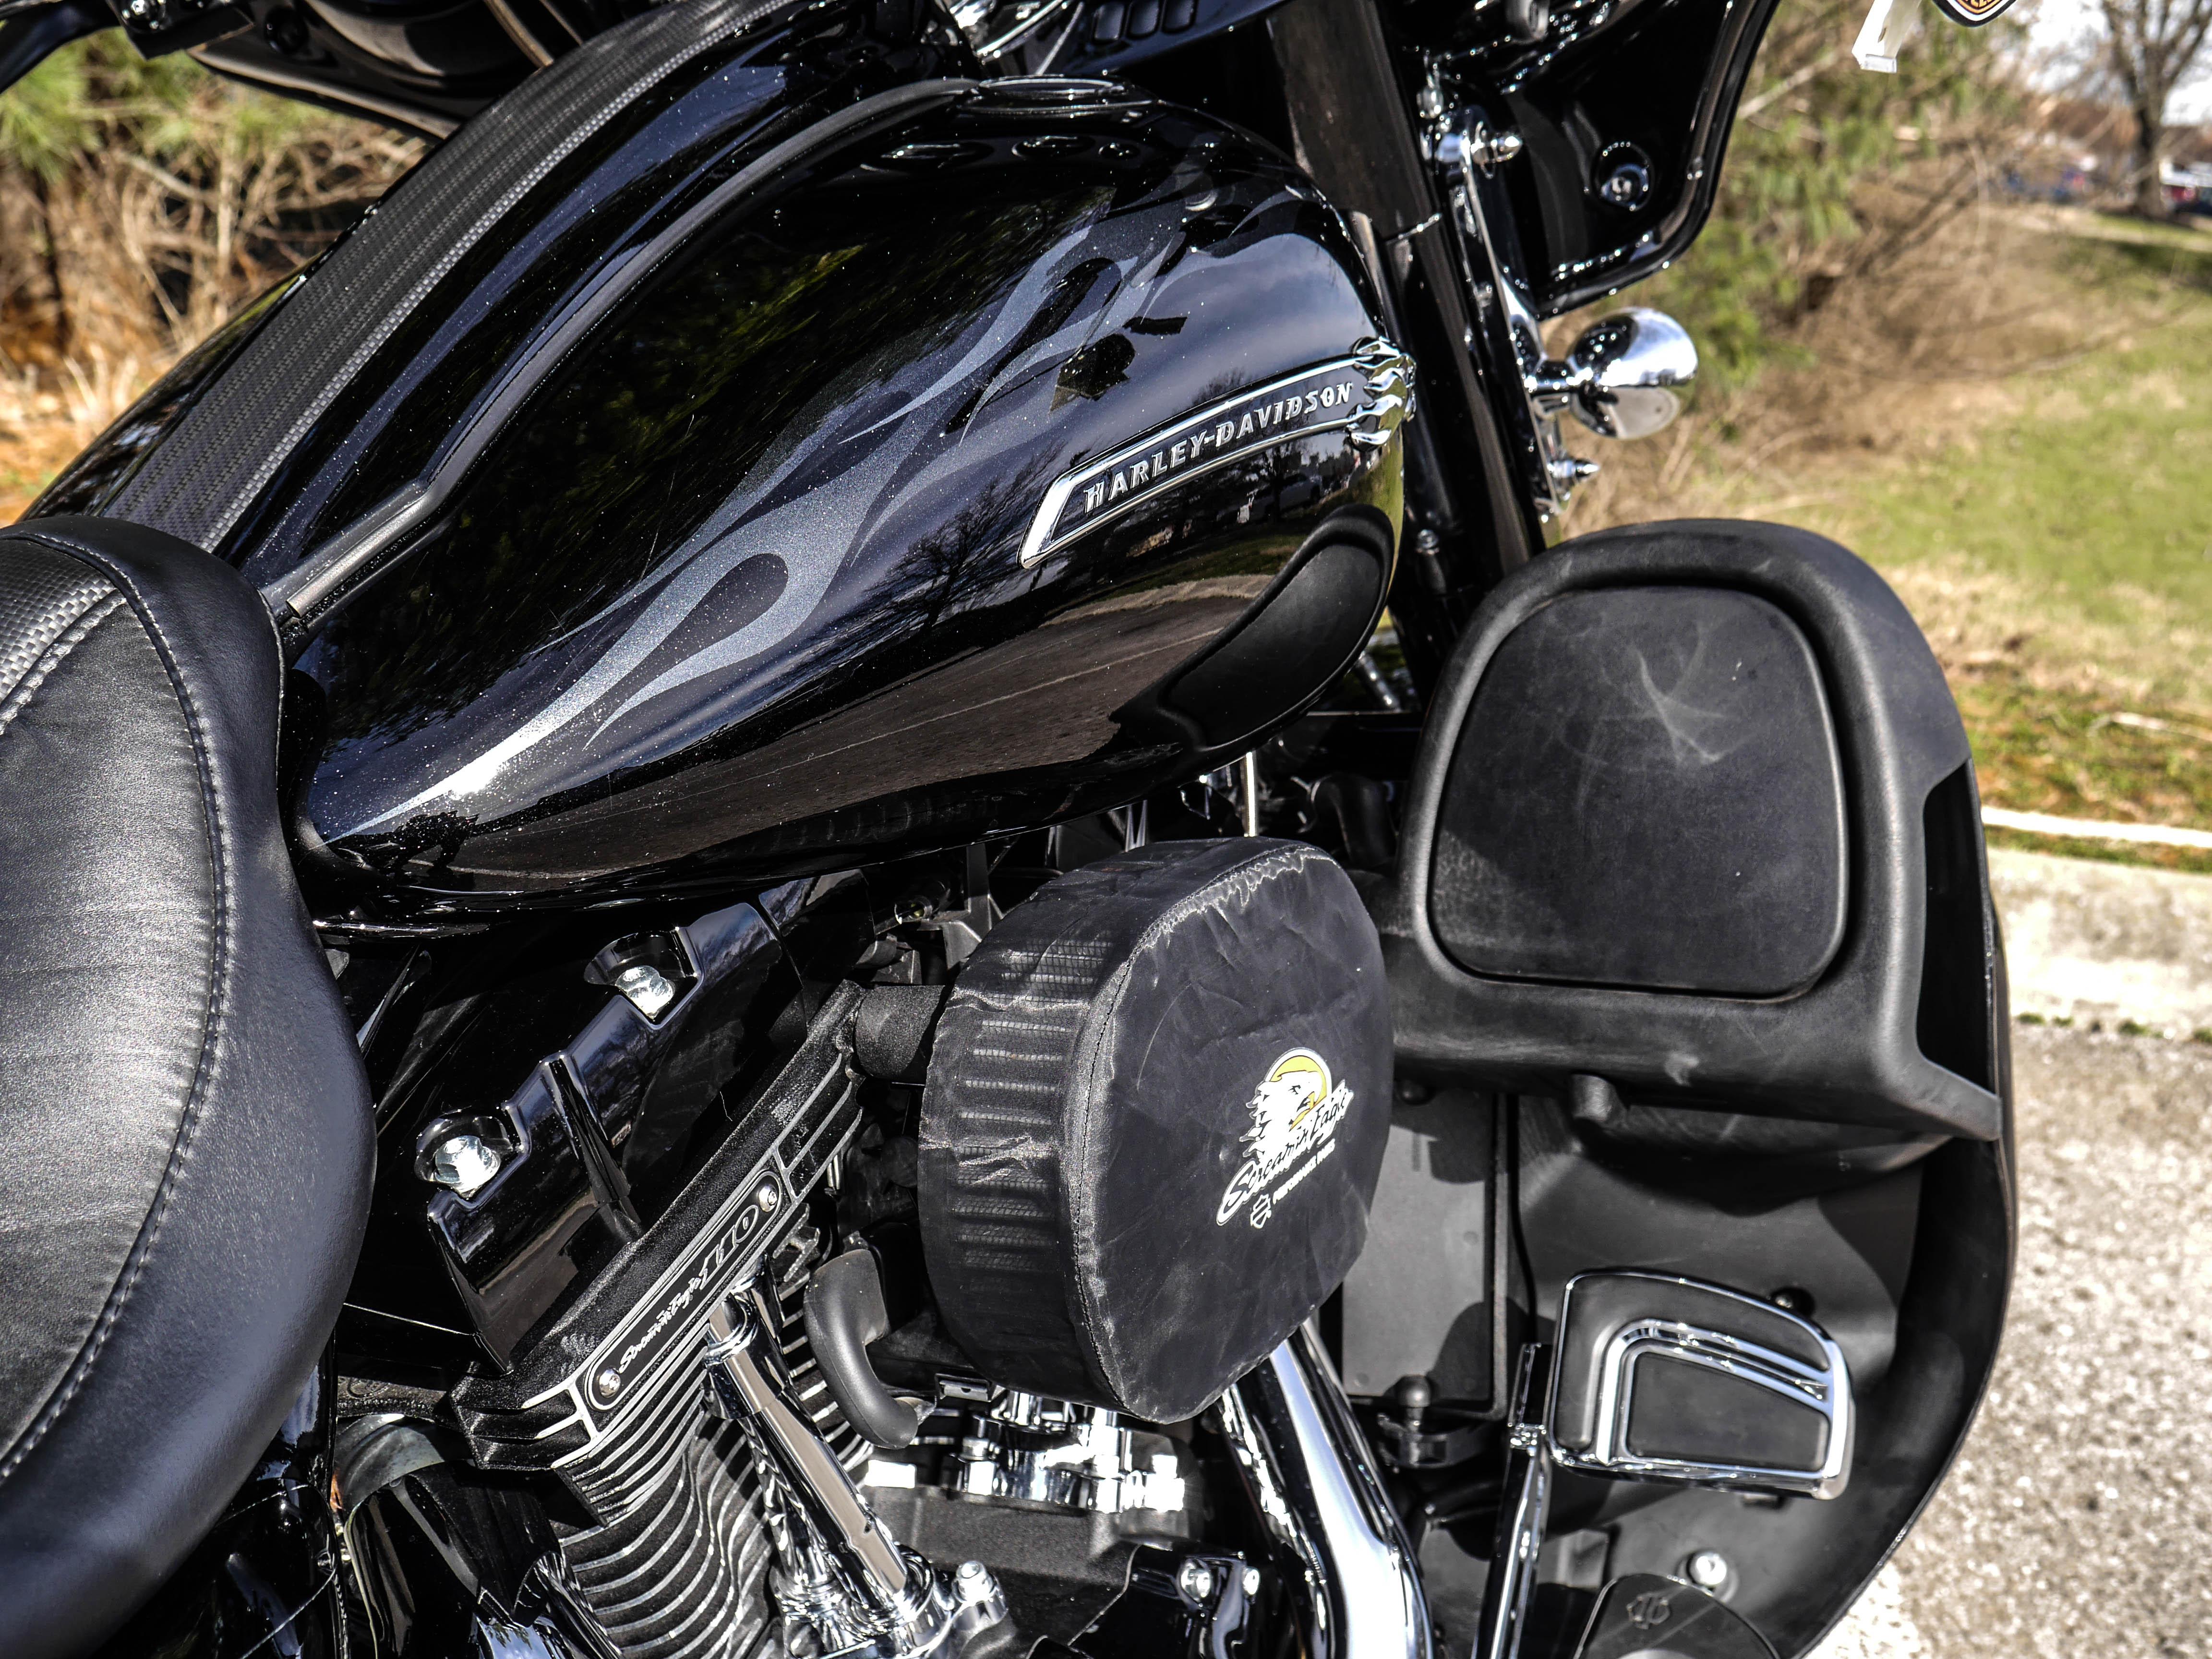 Pre-Owned 2016 Harley-Davidson CVO Street Glide